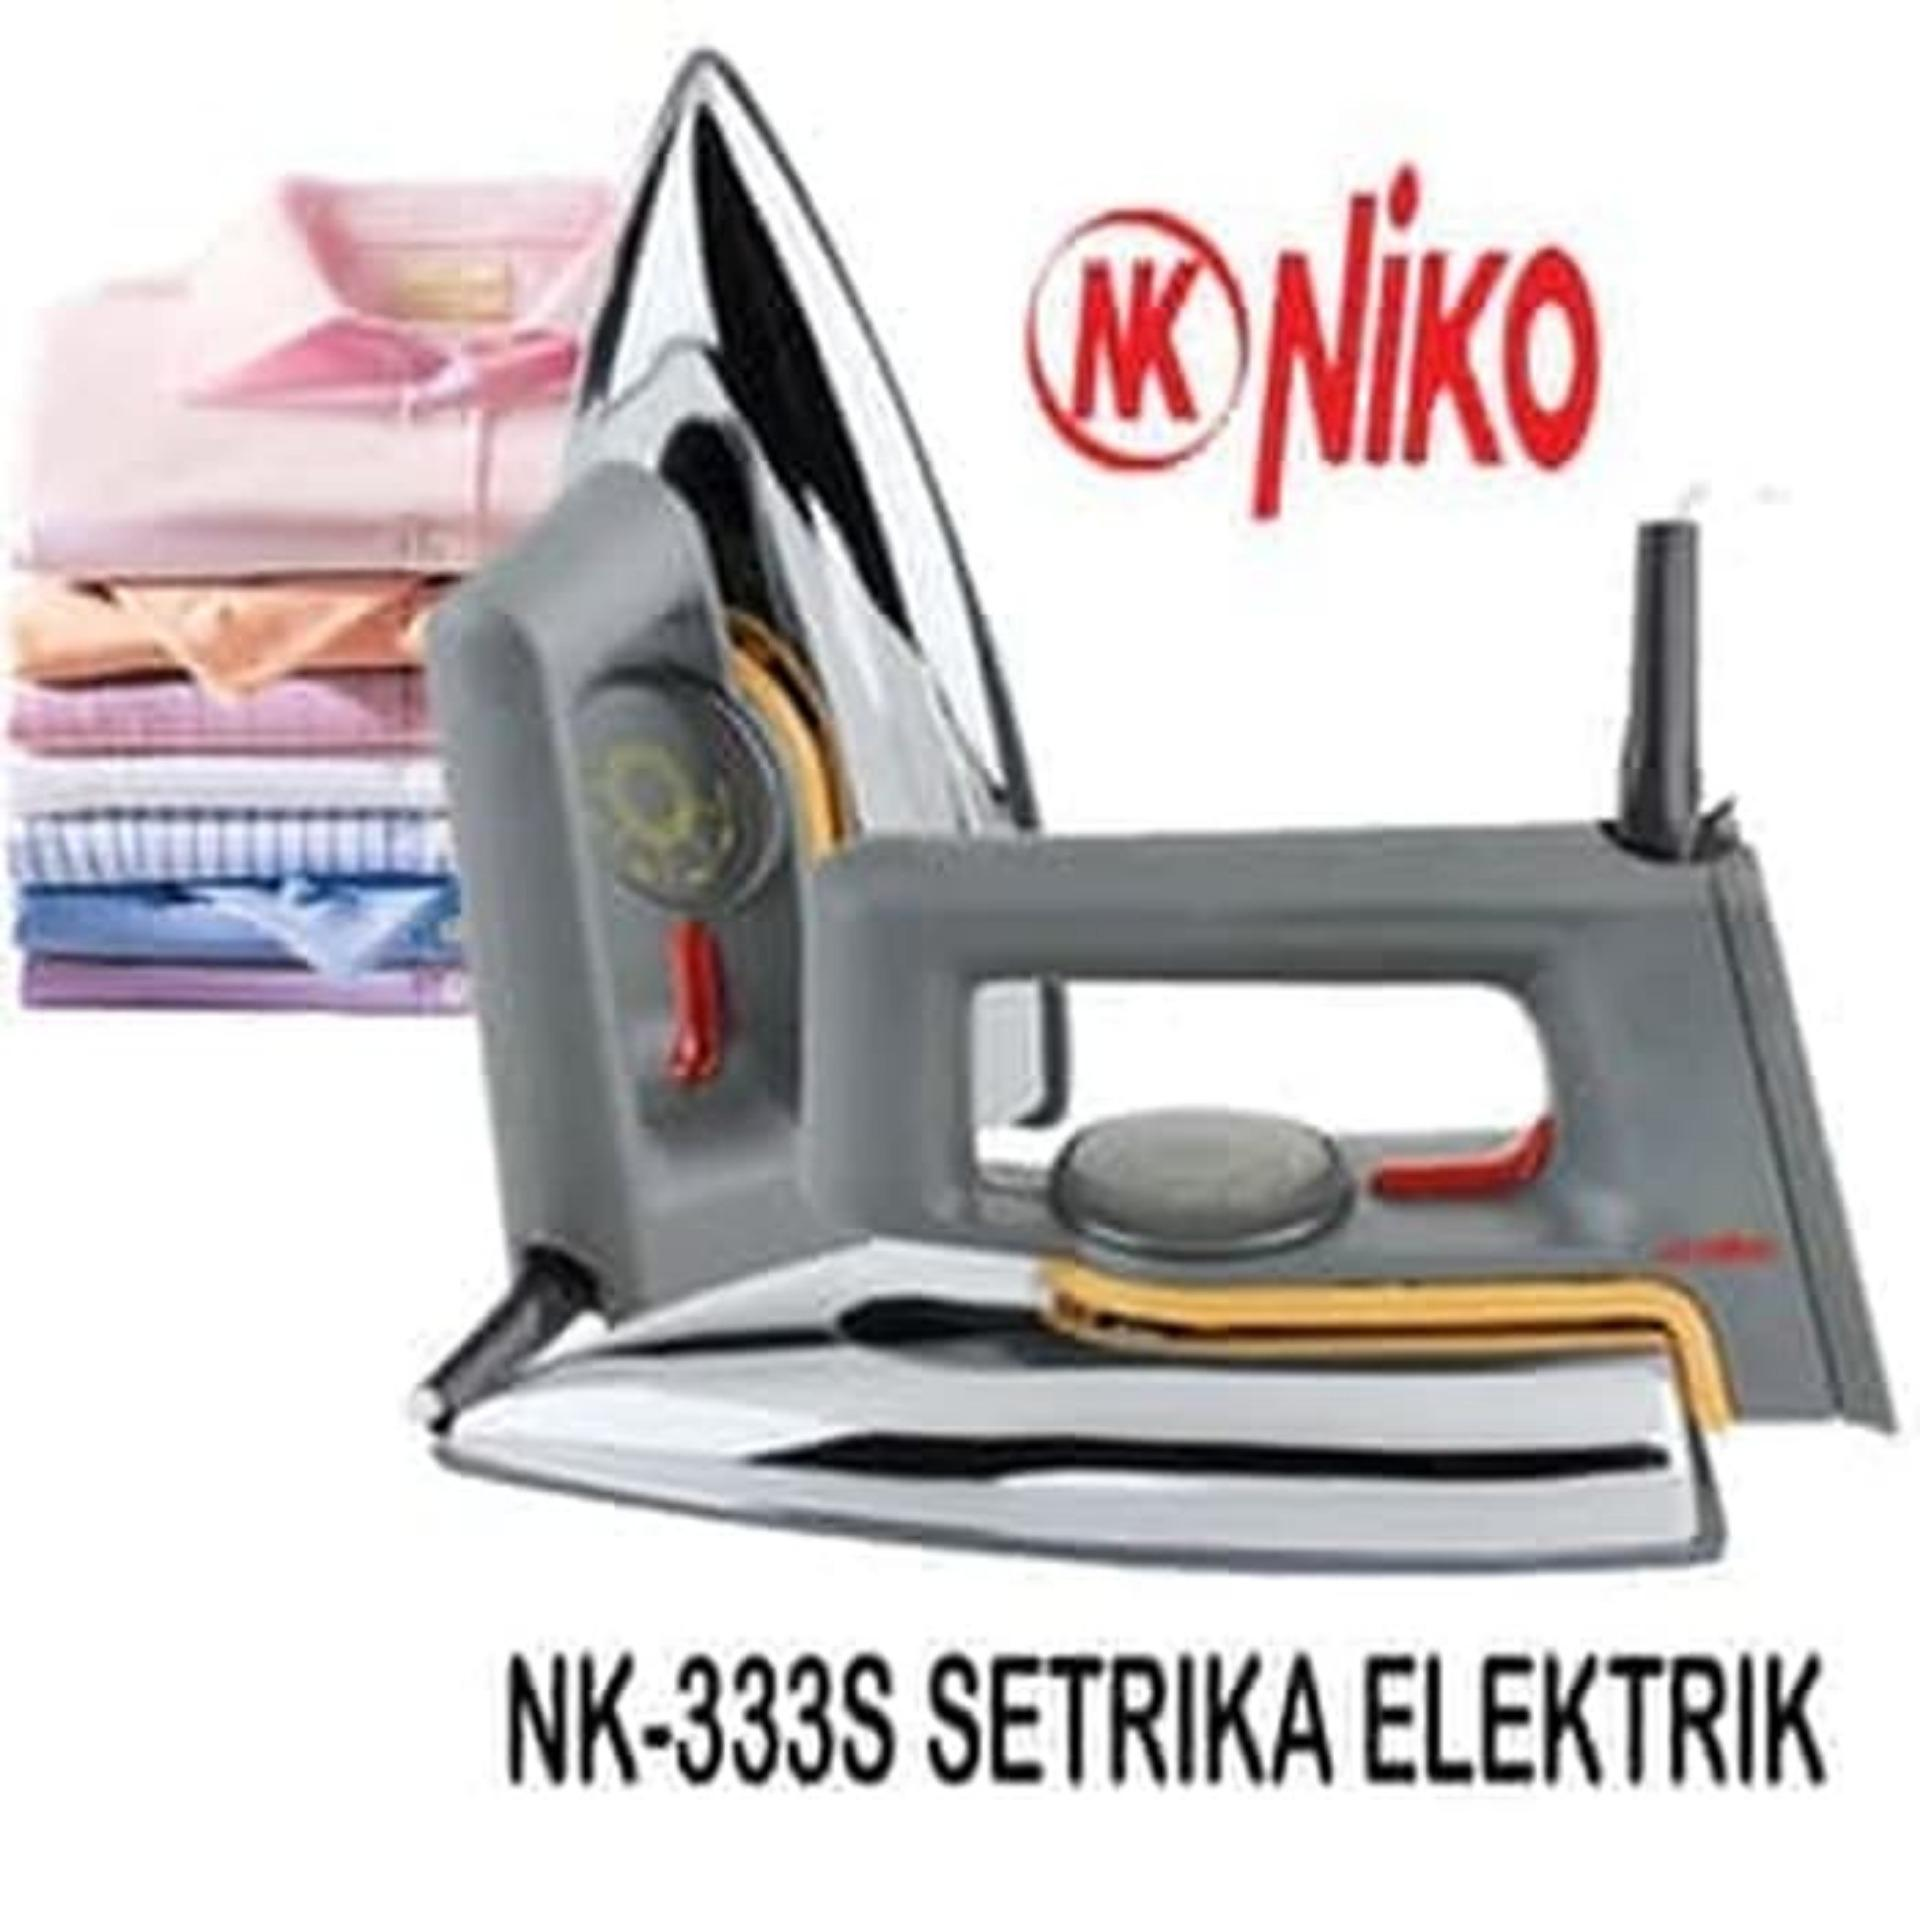 Trisonic T1505 Mixer Com Alat Pengaduk Murah Berkulitas Putih Stand T 1505 Setrika 666 Gosokan Baju Berkualitas